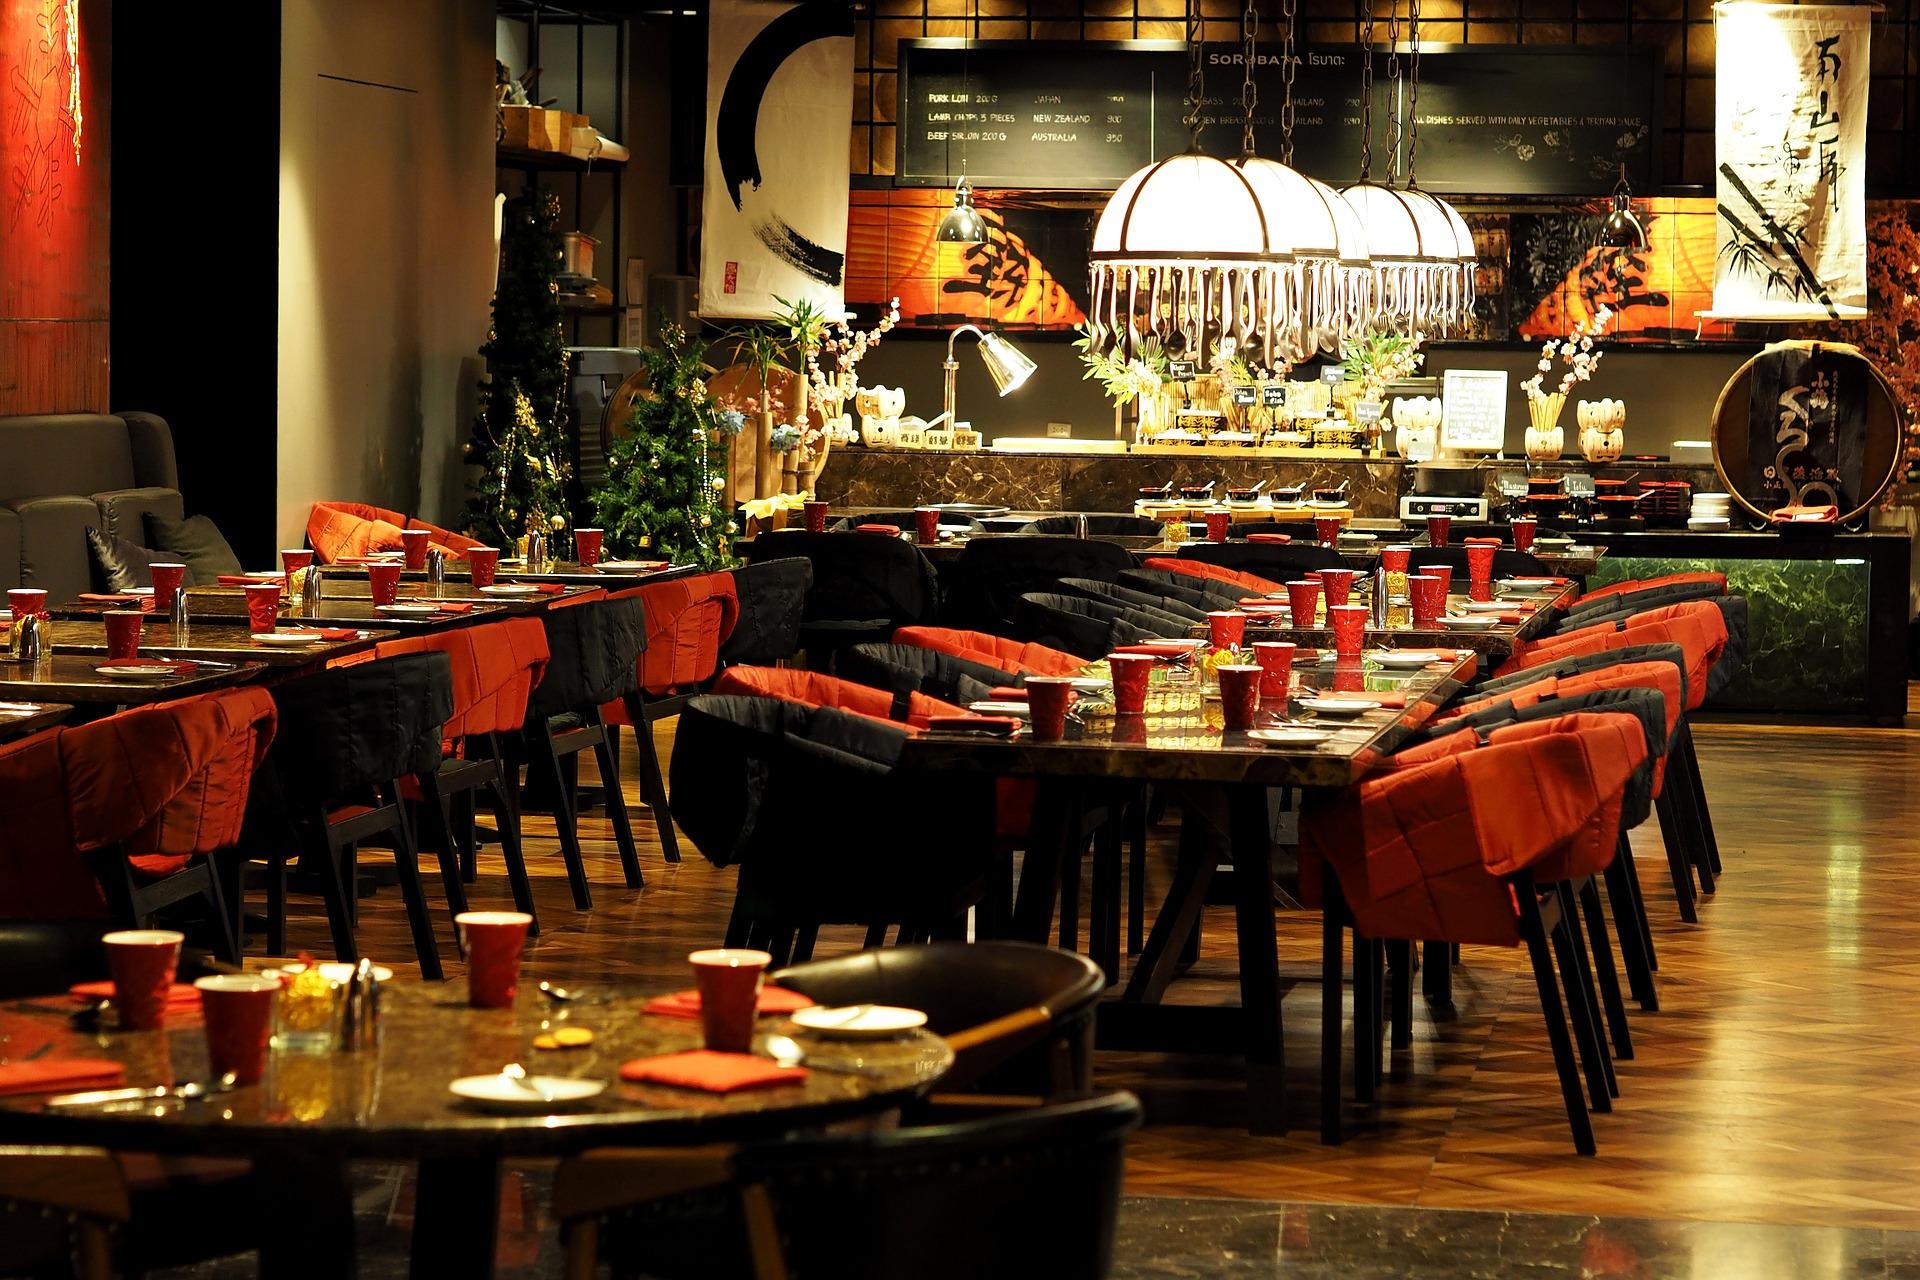 restaurant-1090136_1920